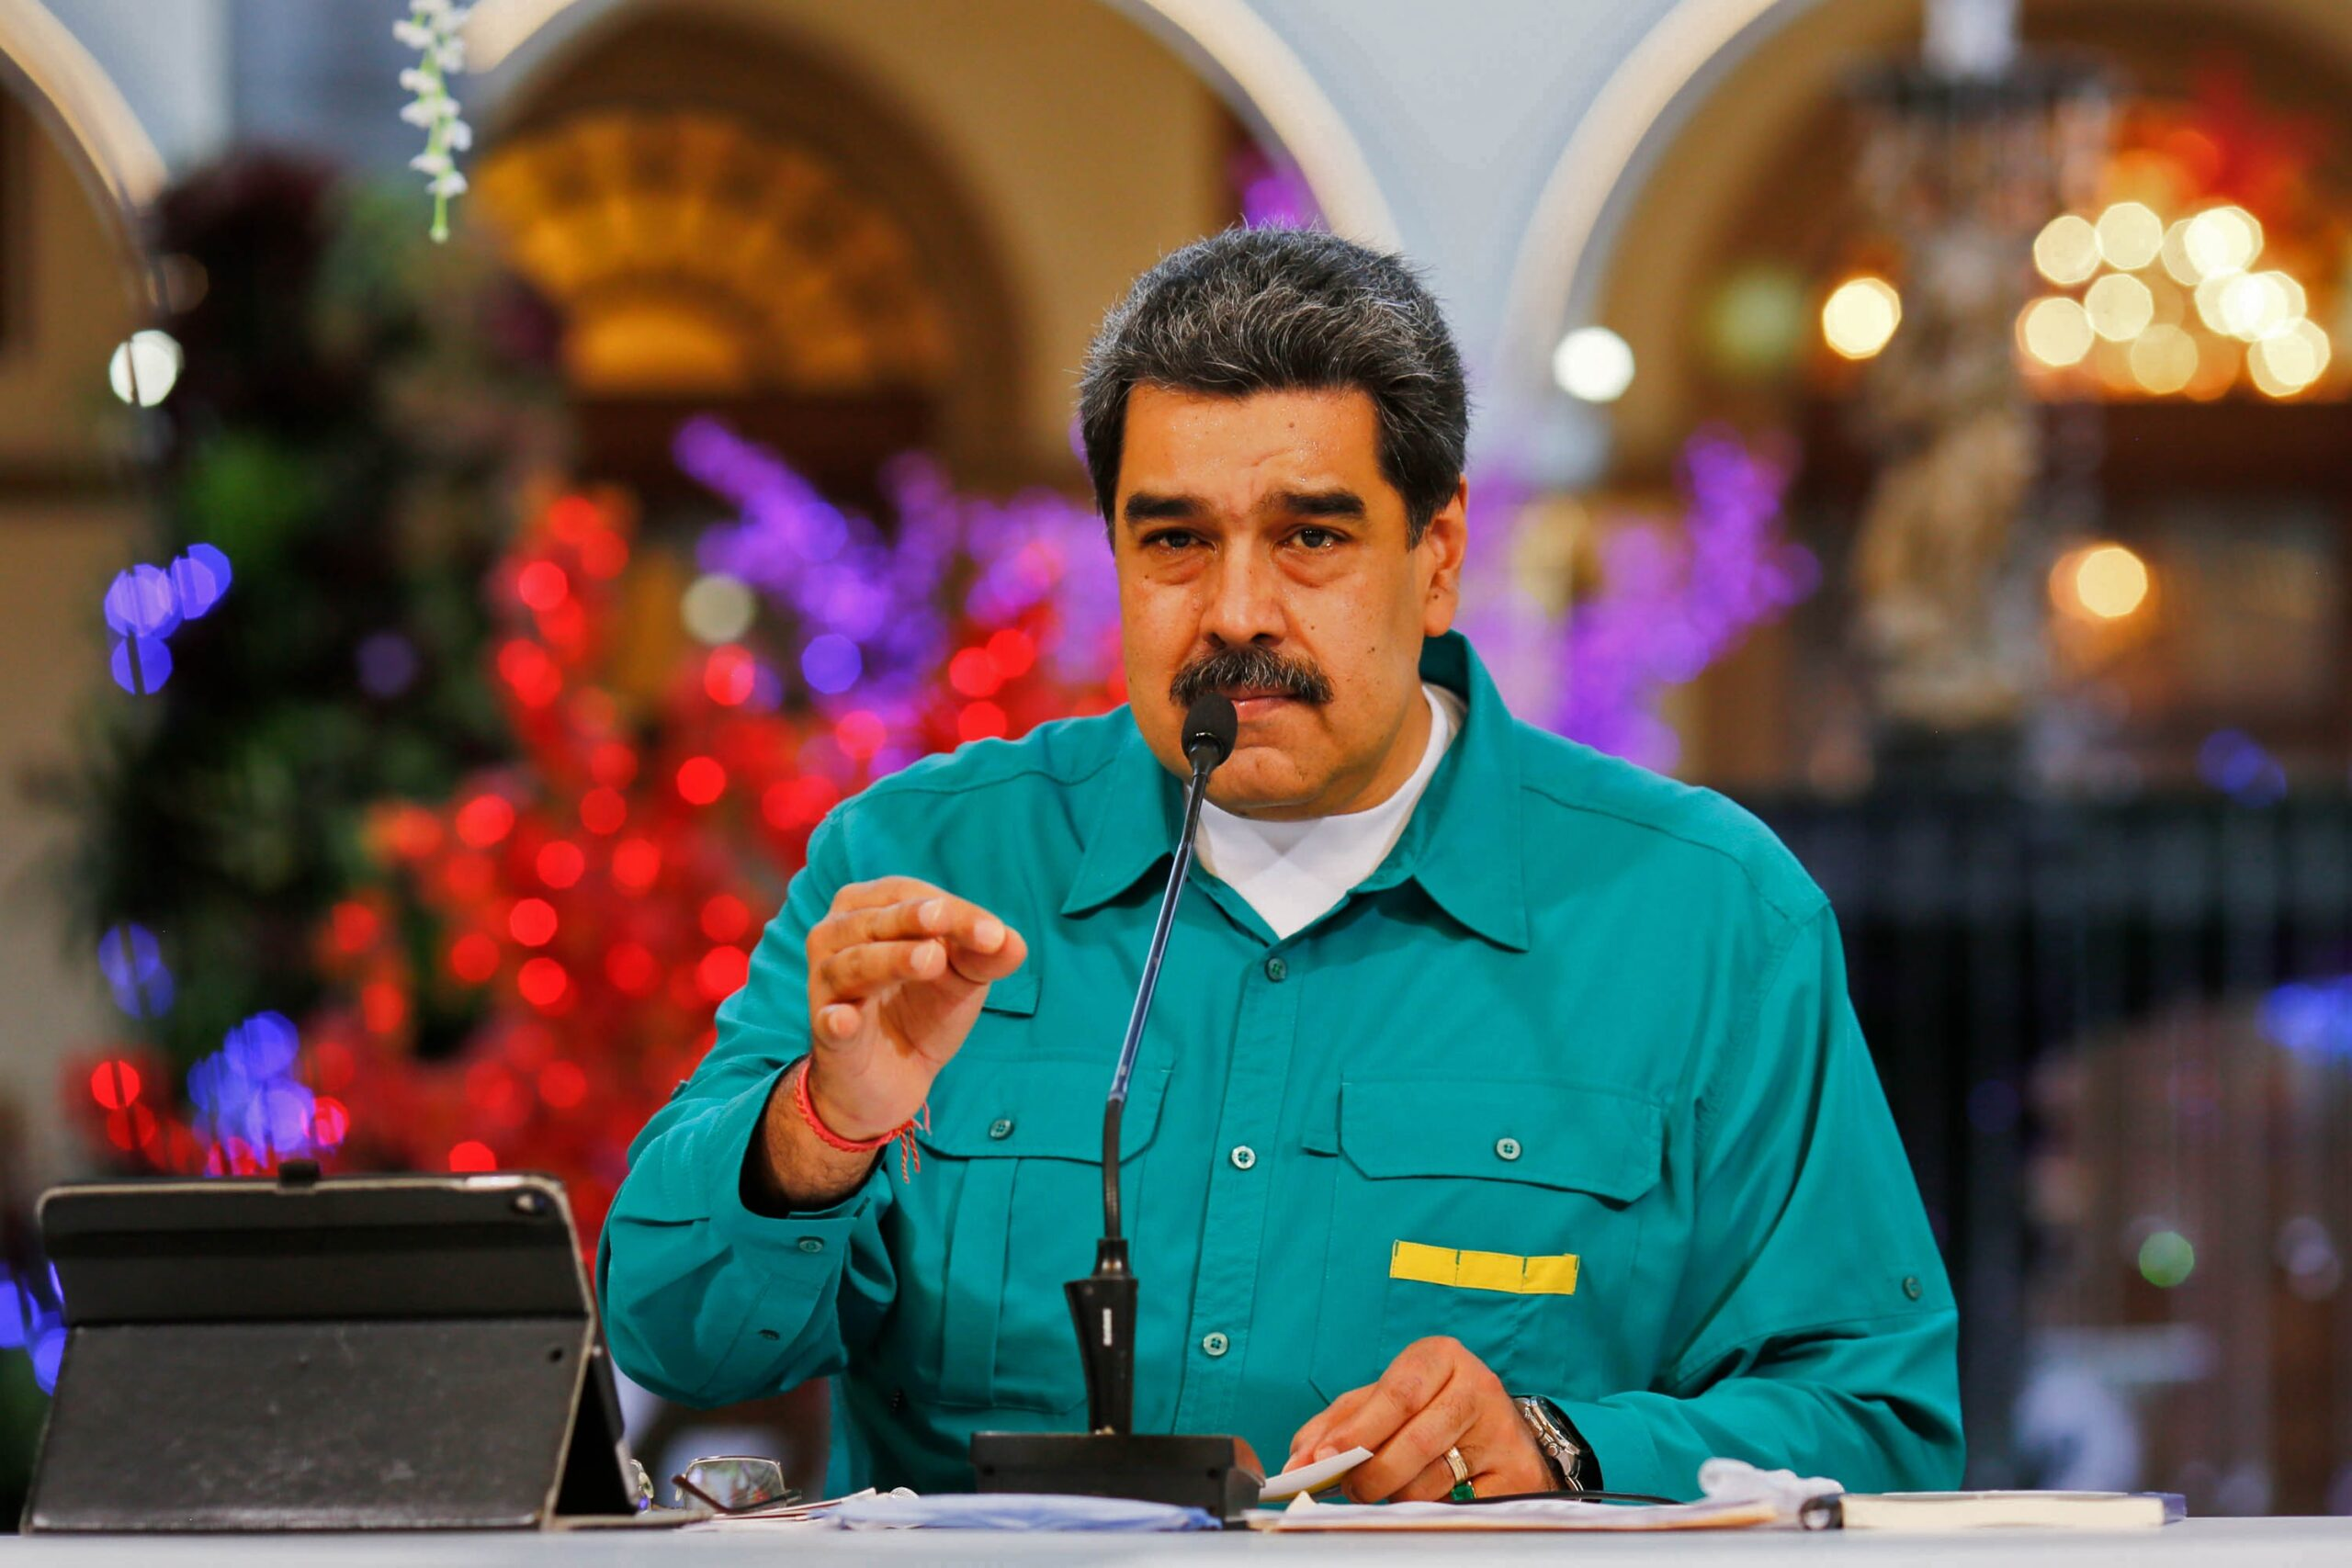 Venezuelan President Blames Rival for Trump's Apparent Election Defeat